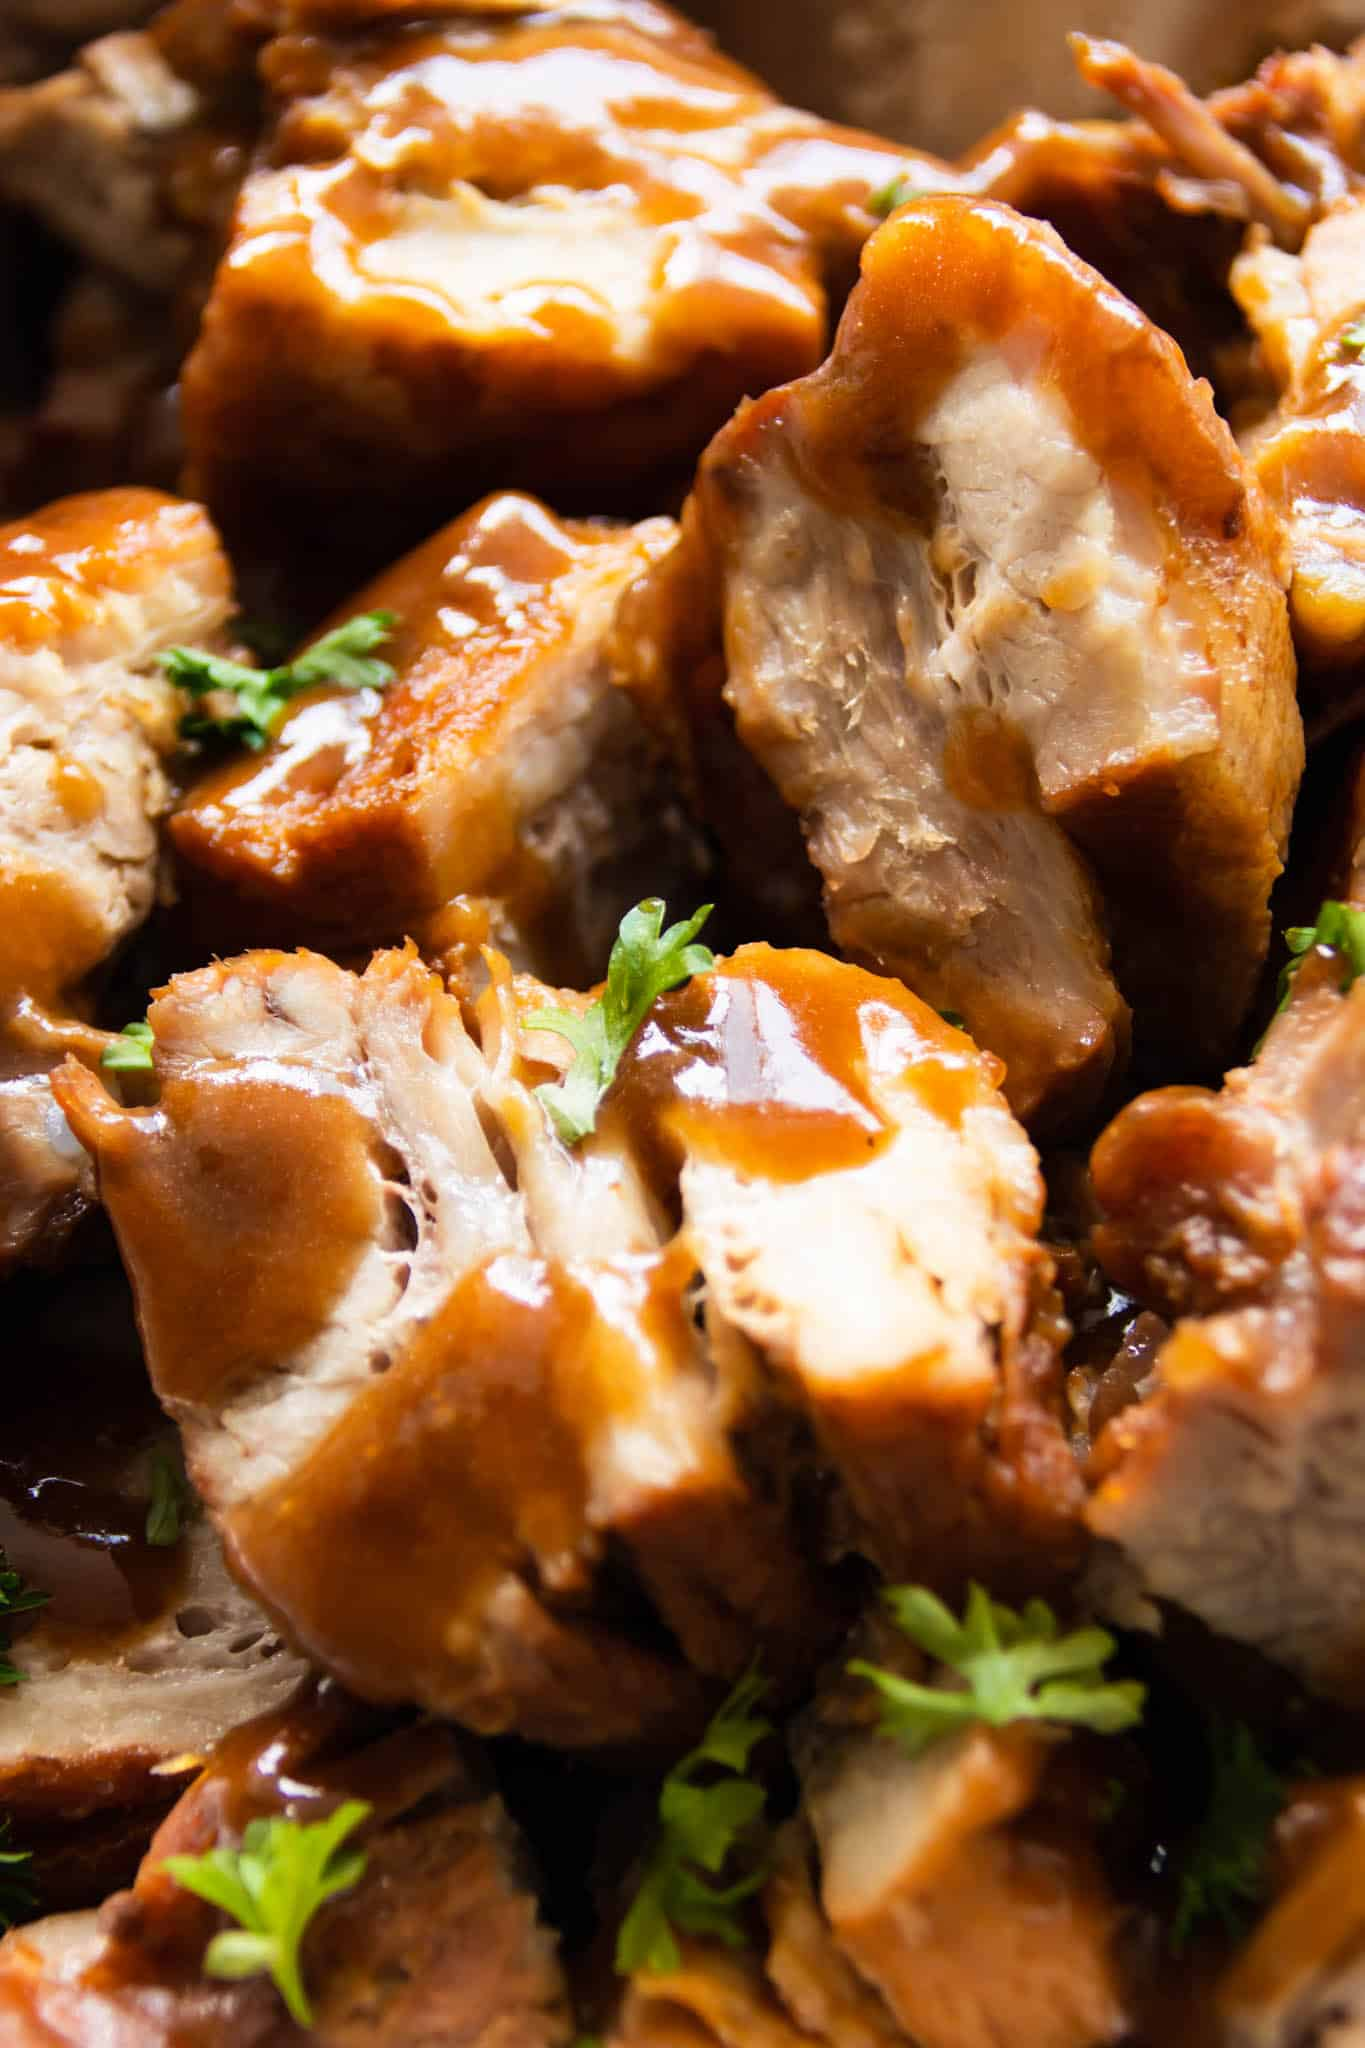 Braised pork in soy bean paste